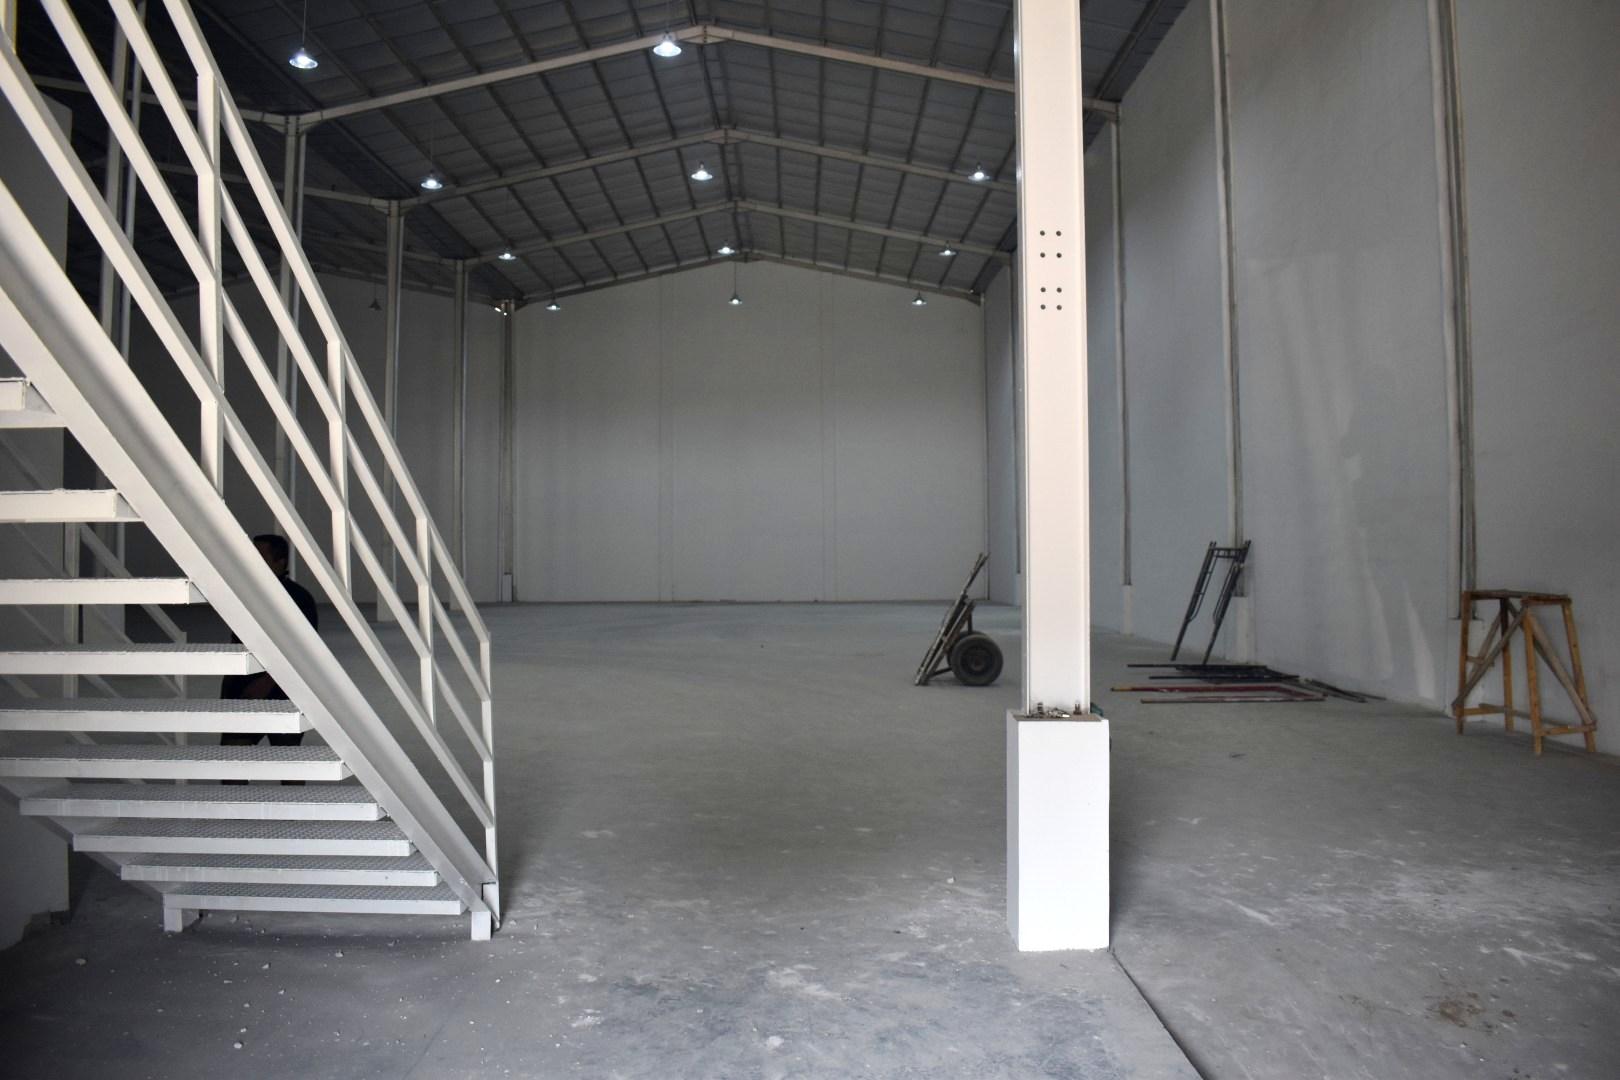 Sewa Gudang Baru Loading Dock Kawasan Industri Delta Silicon Cikarang - 4